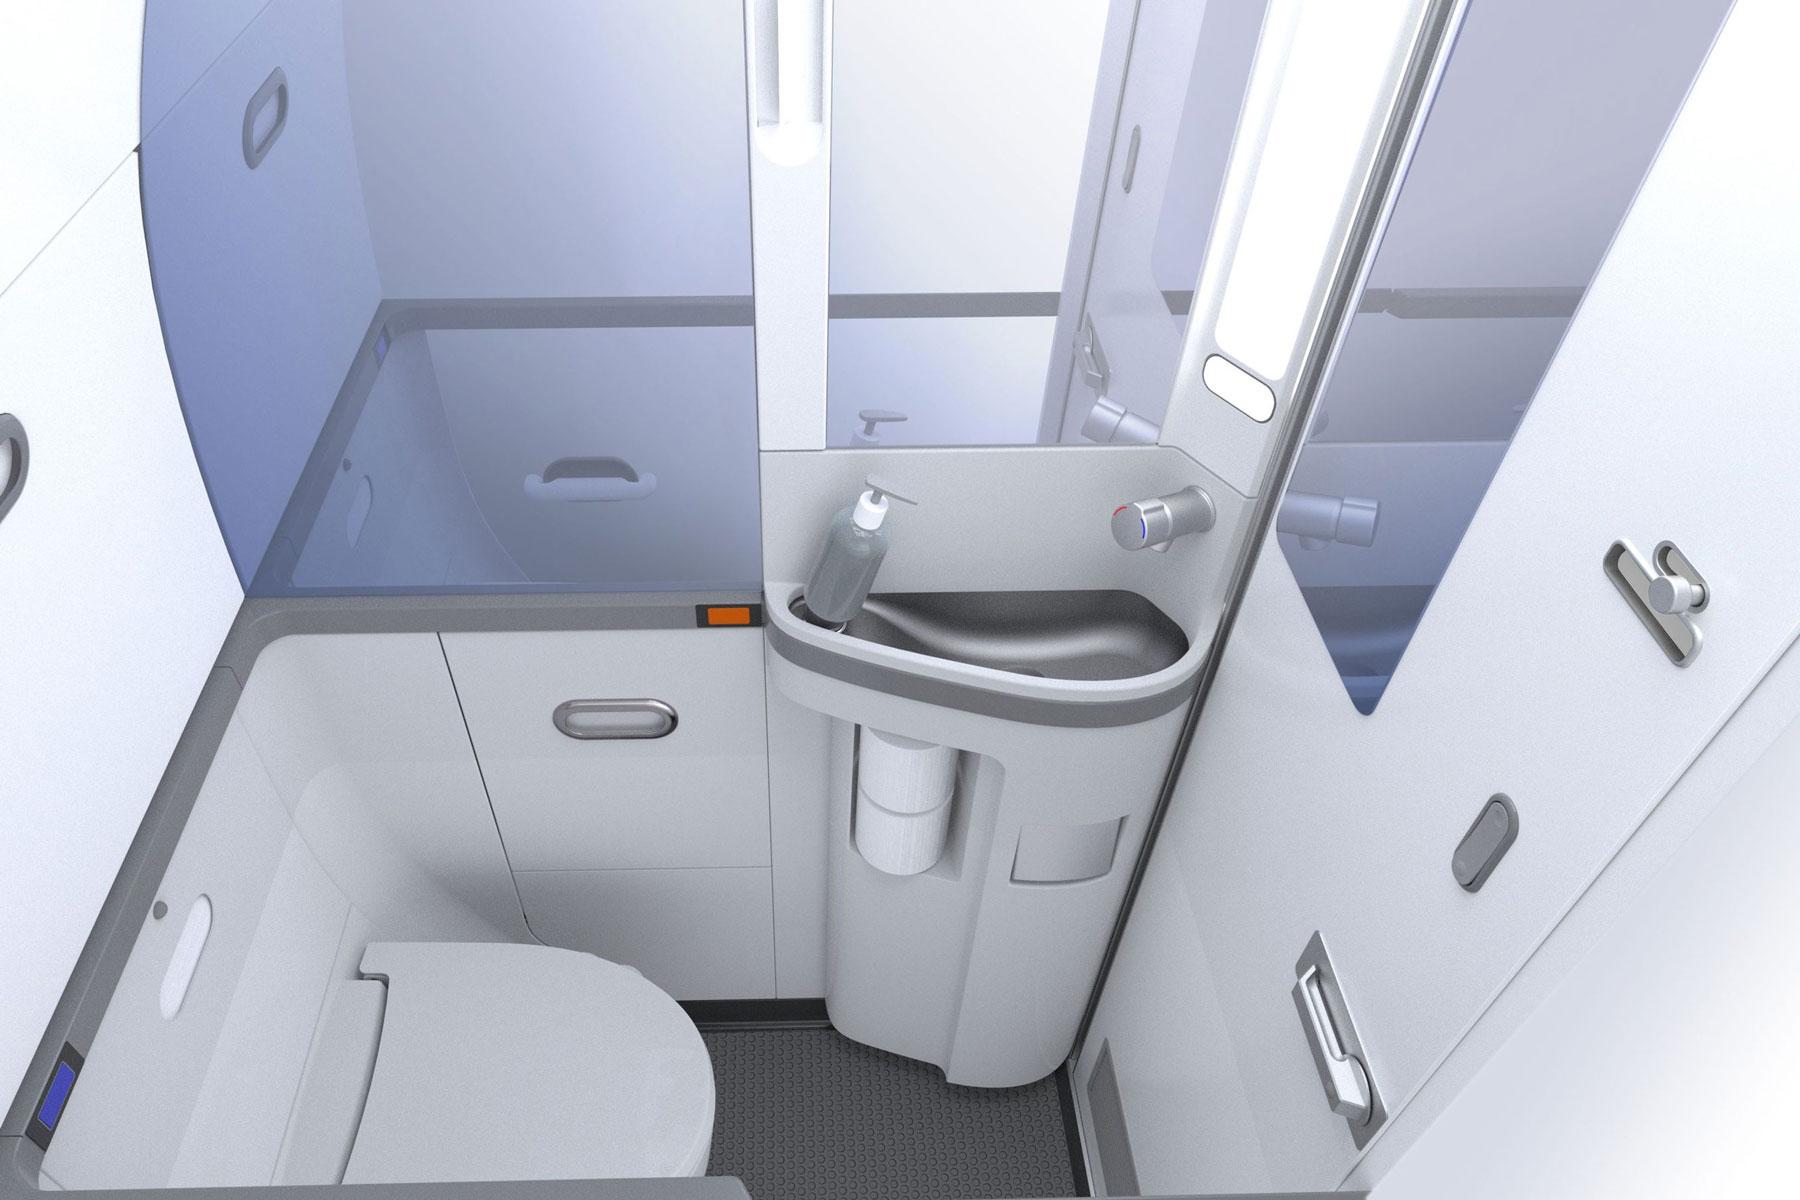 'Rude' Aeroplane Toilet Behaviour Divides The Internet